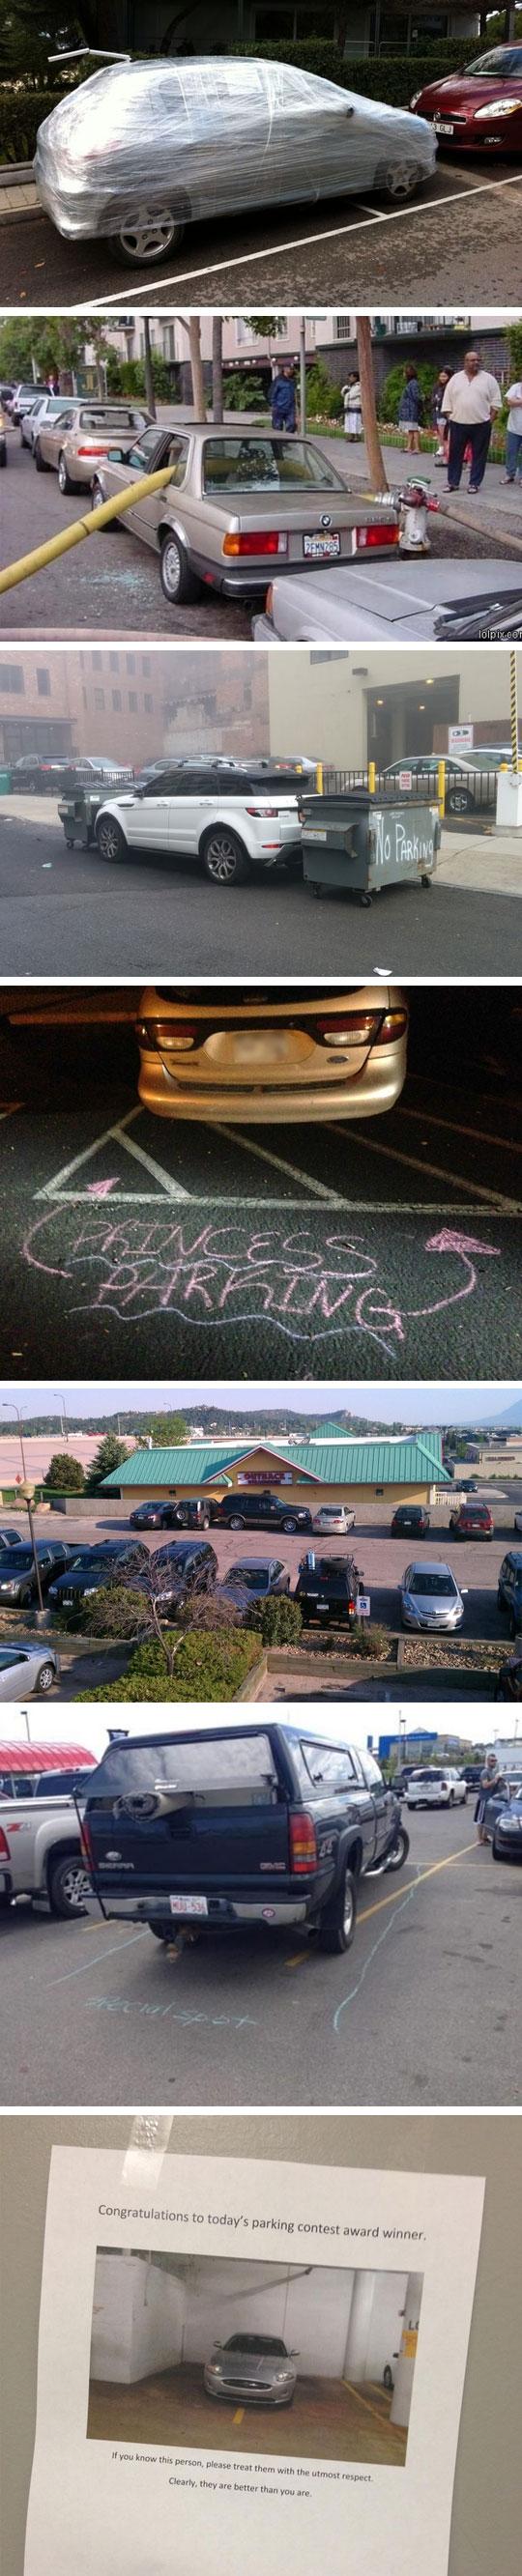 funny-car-parking-prank-fail